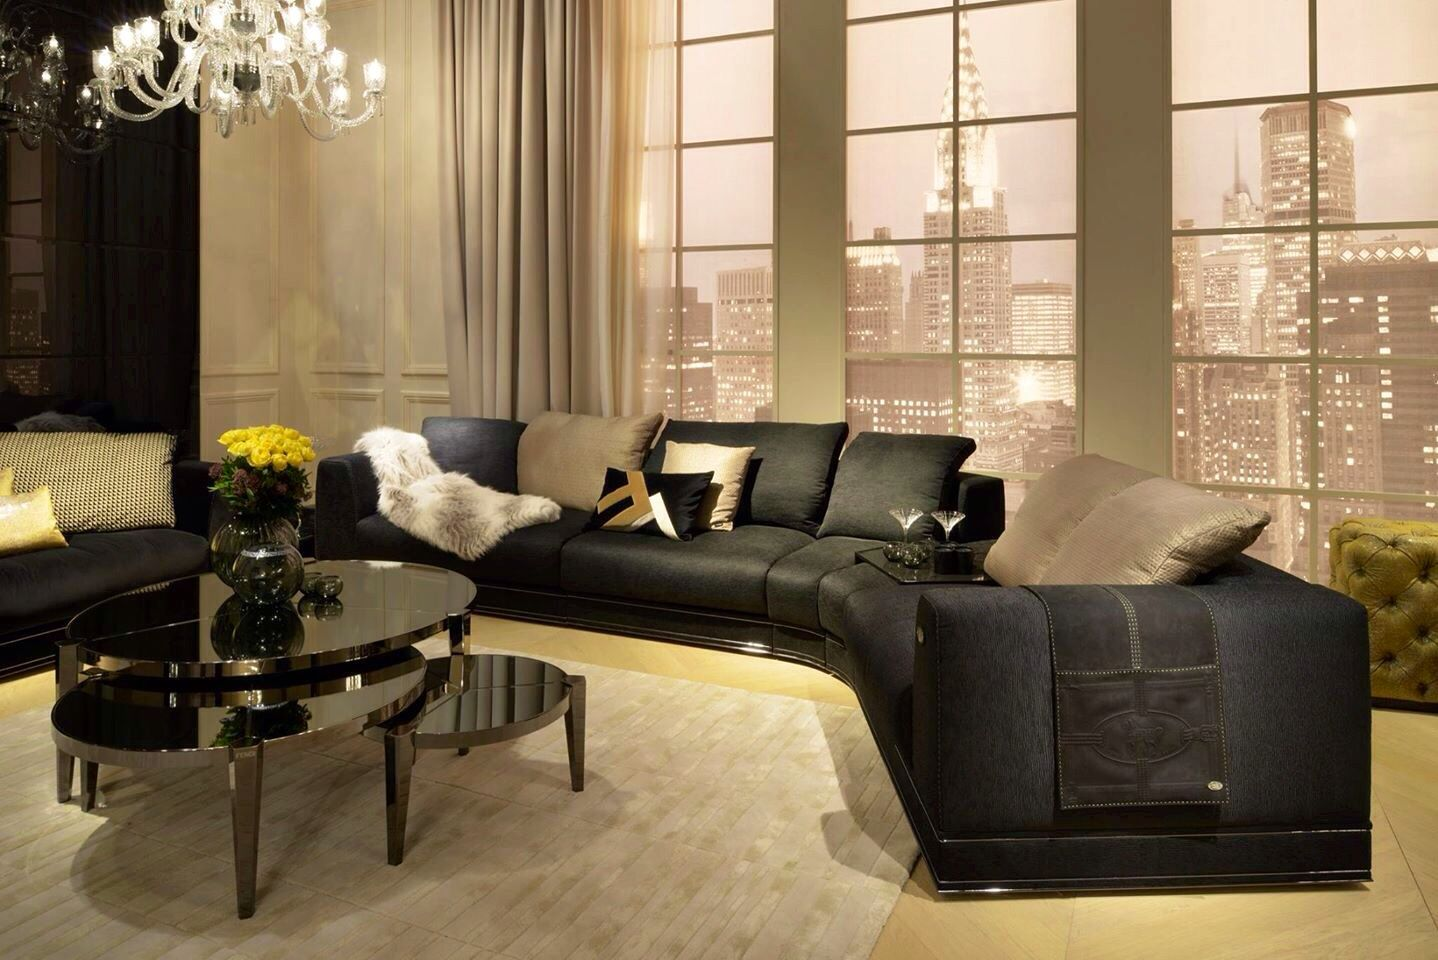 Fendi Livingroom 2014 Luxury Living RoomsHome DecorationsDecor